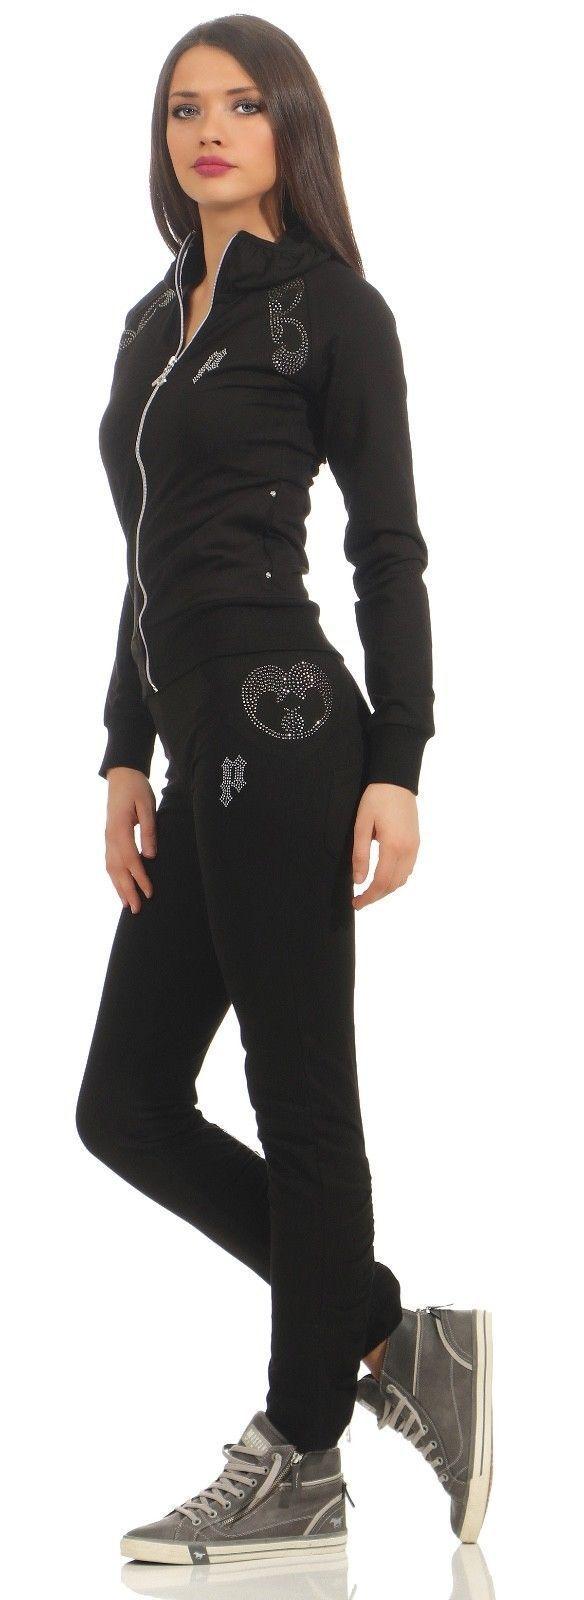 Pari Line Anzug Jogginganzug Wohlfühlanzug Trainingsanzug Schwarz Hausanzug Dame